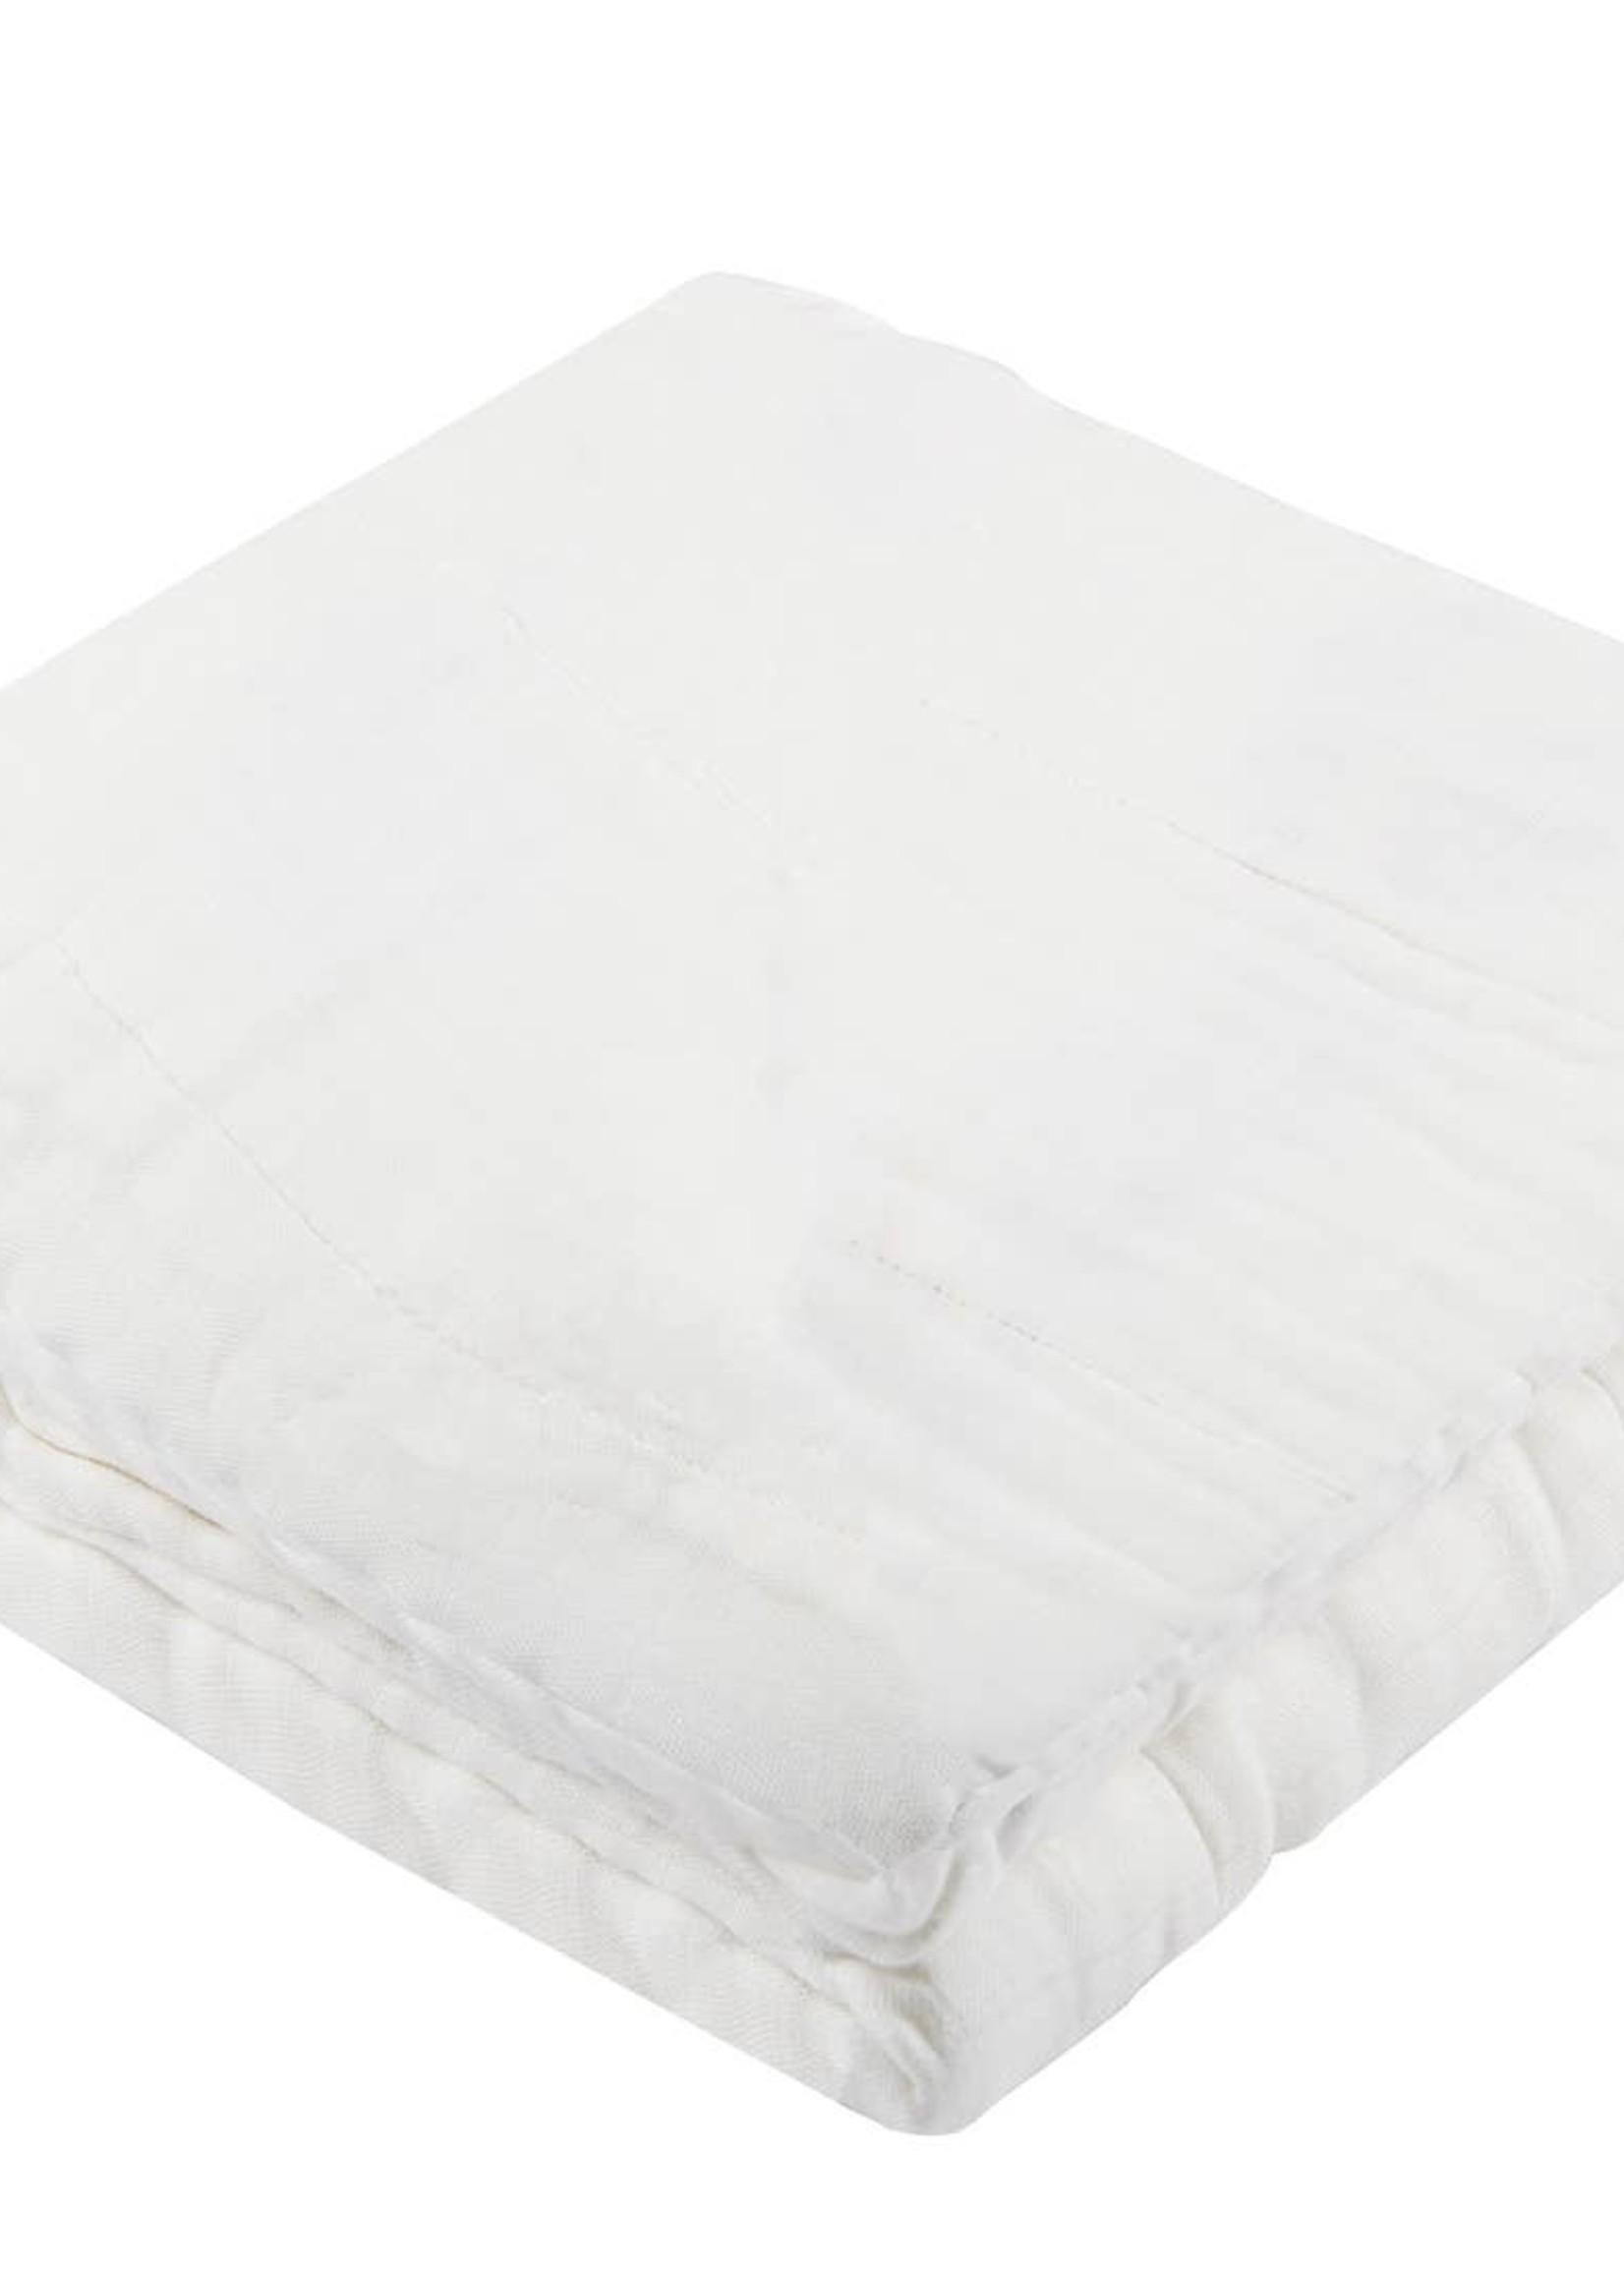 Newcastle classics White Cotton Blanket